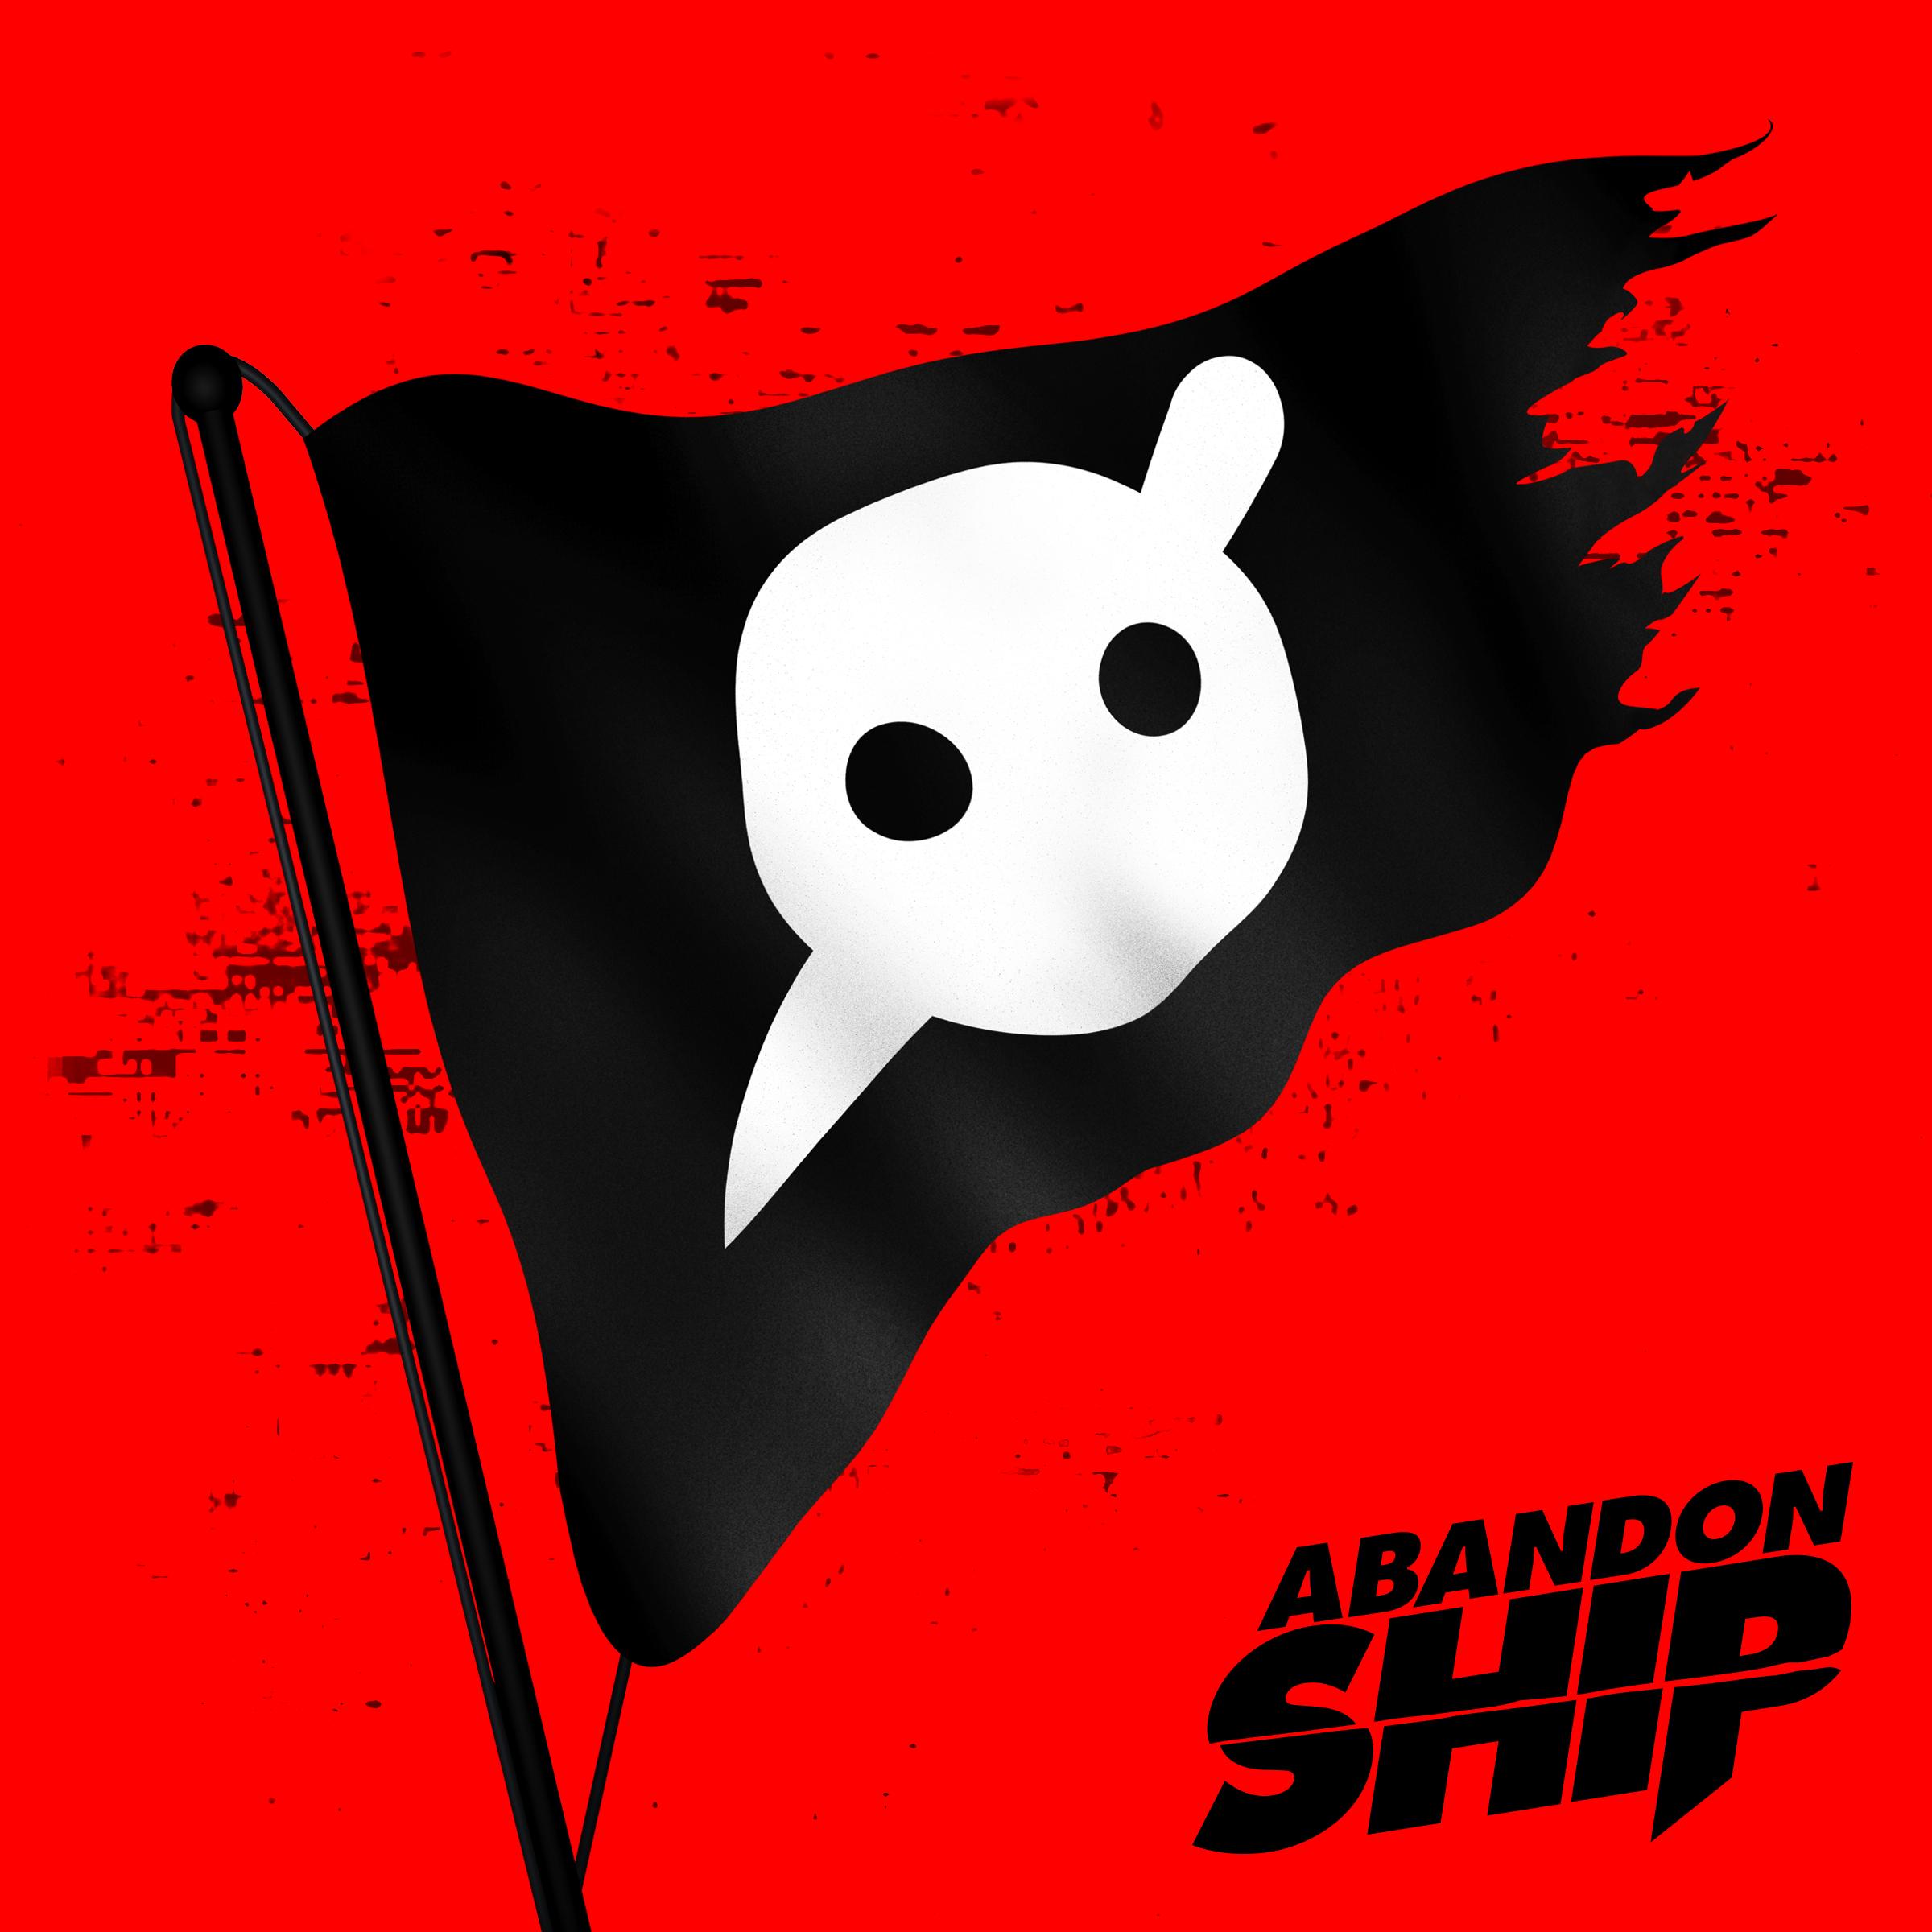 knifeparty_abandon-ship_itunes_artwork-copy